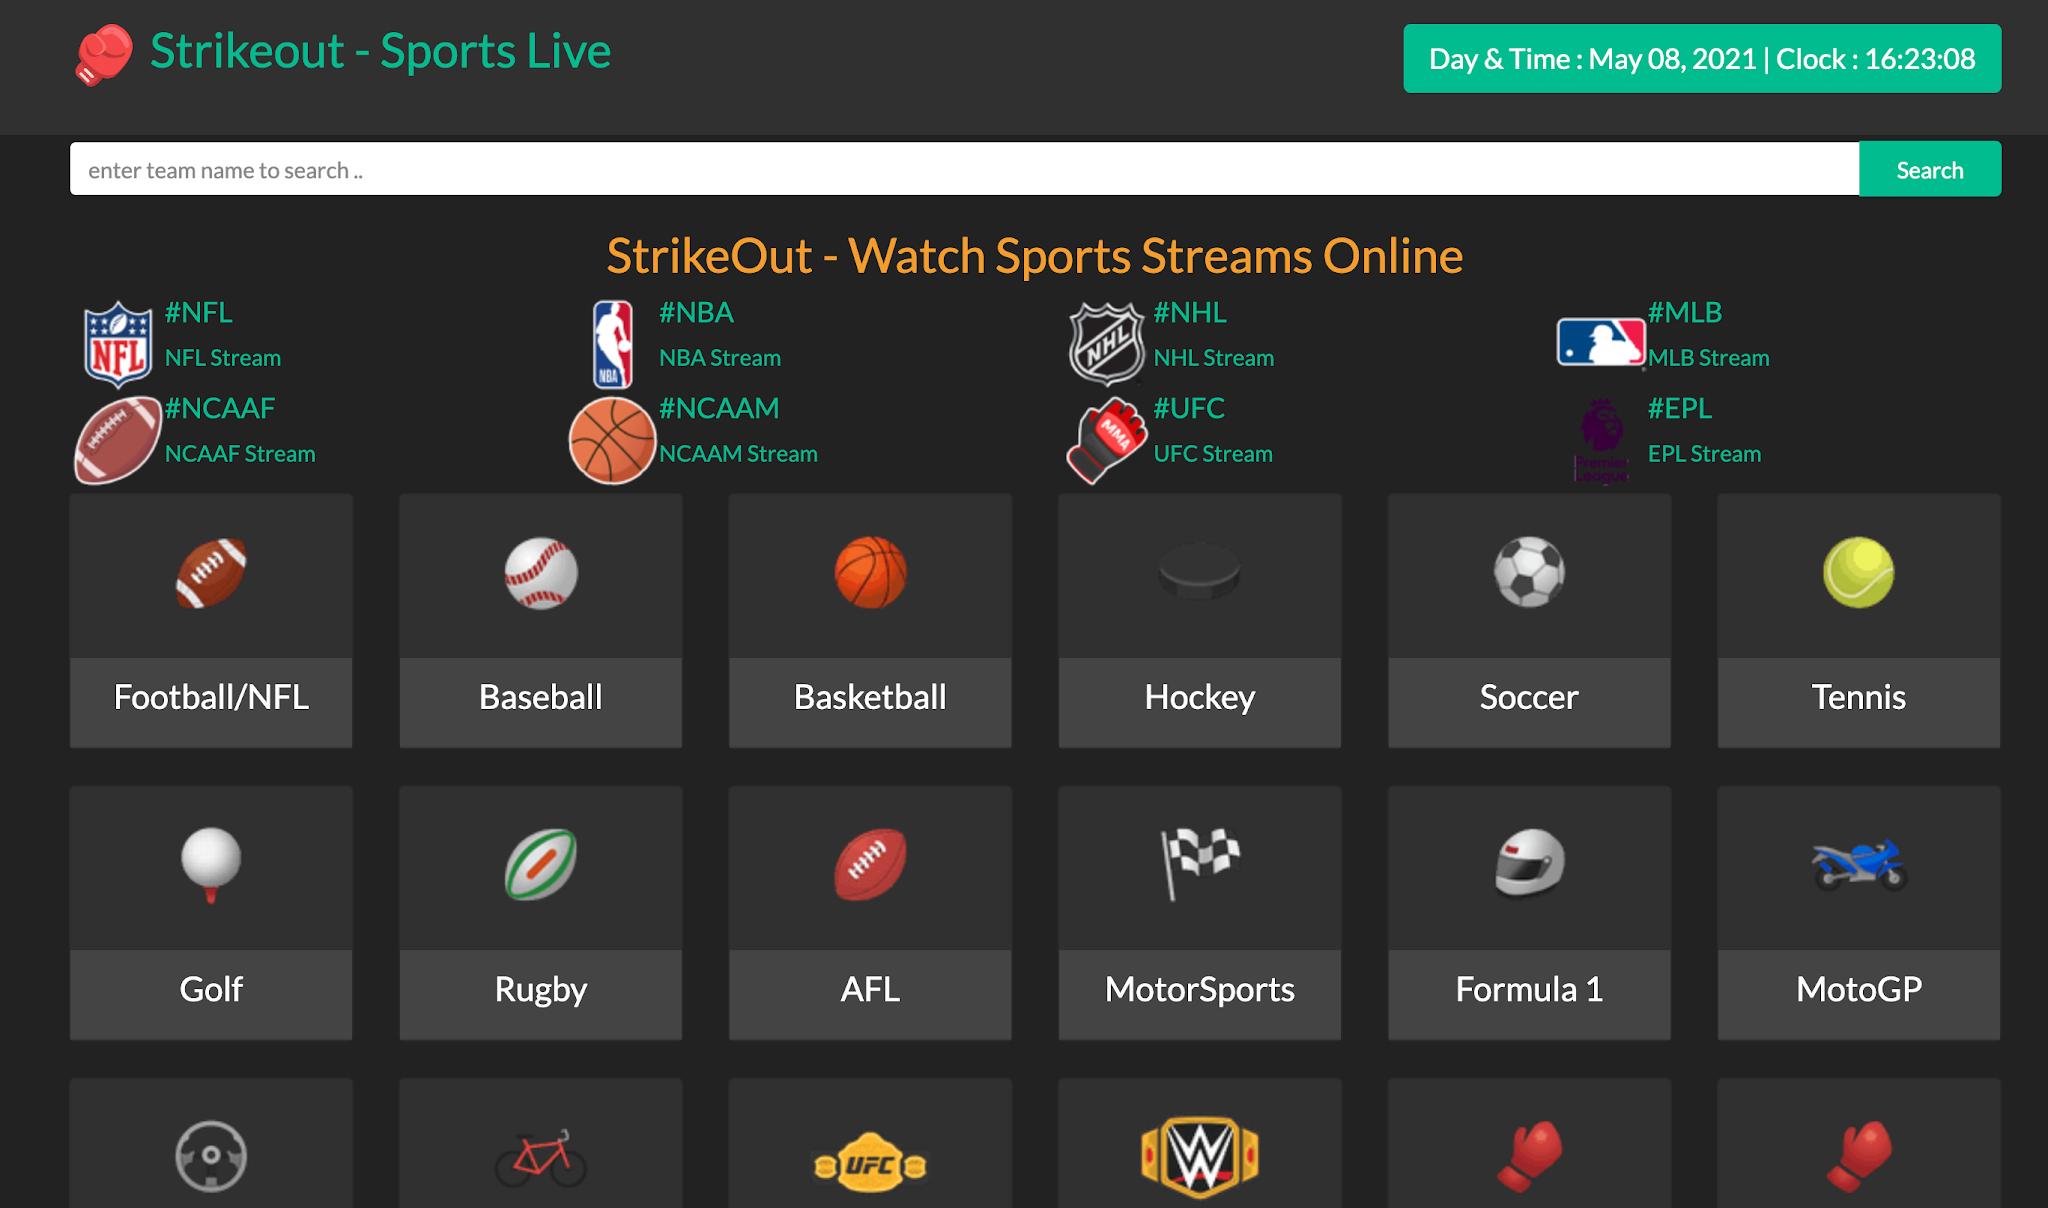 StrikeOut - Watch Sports Streams Online